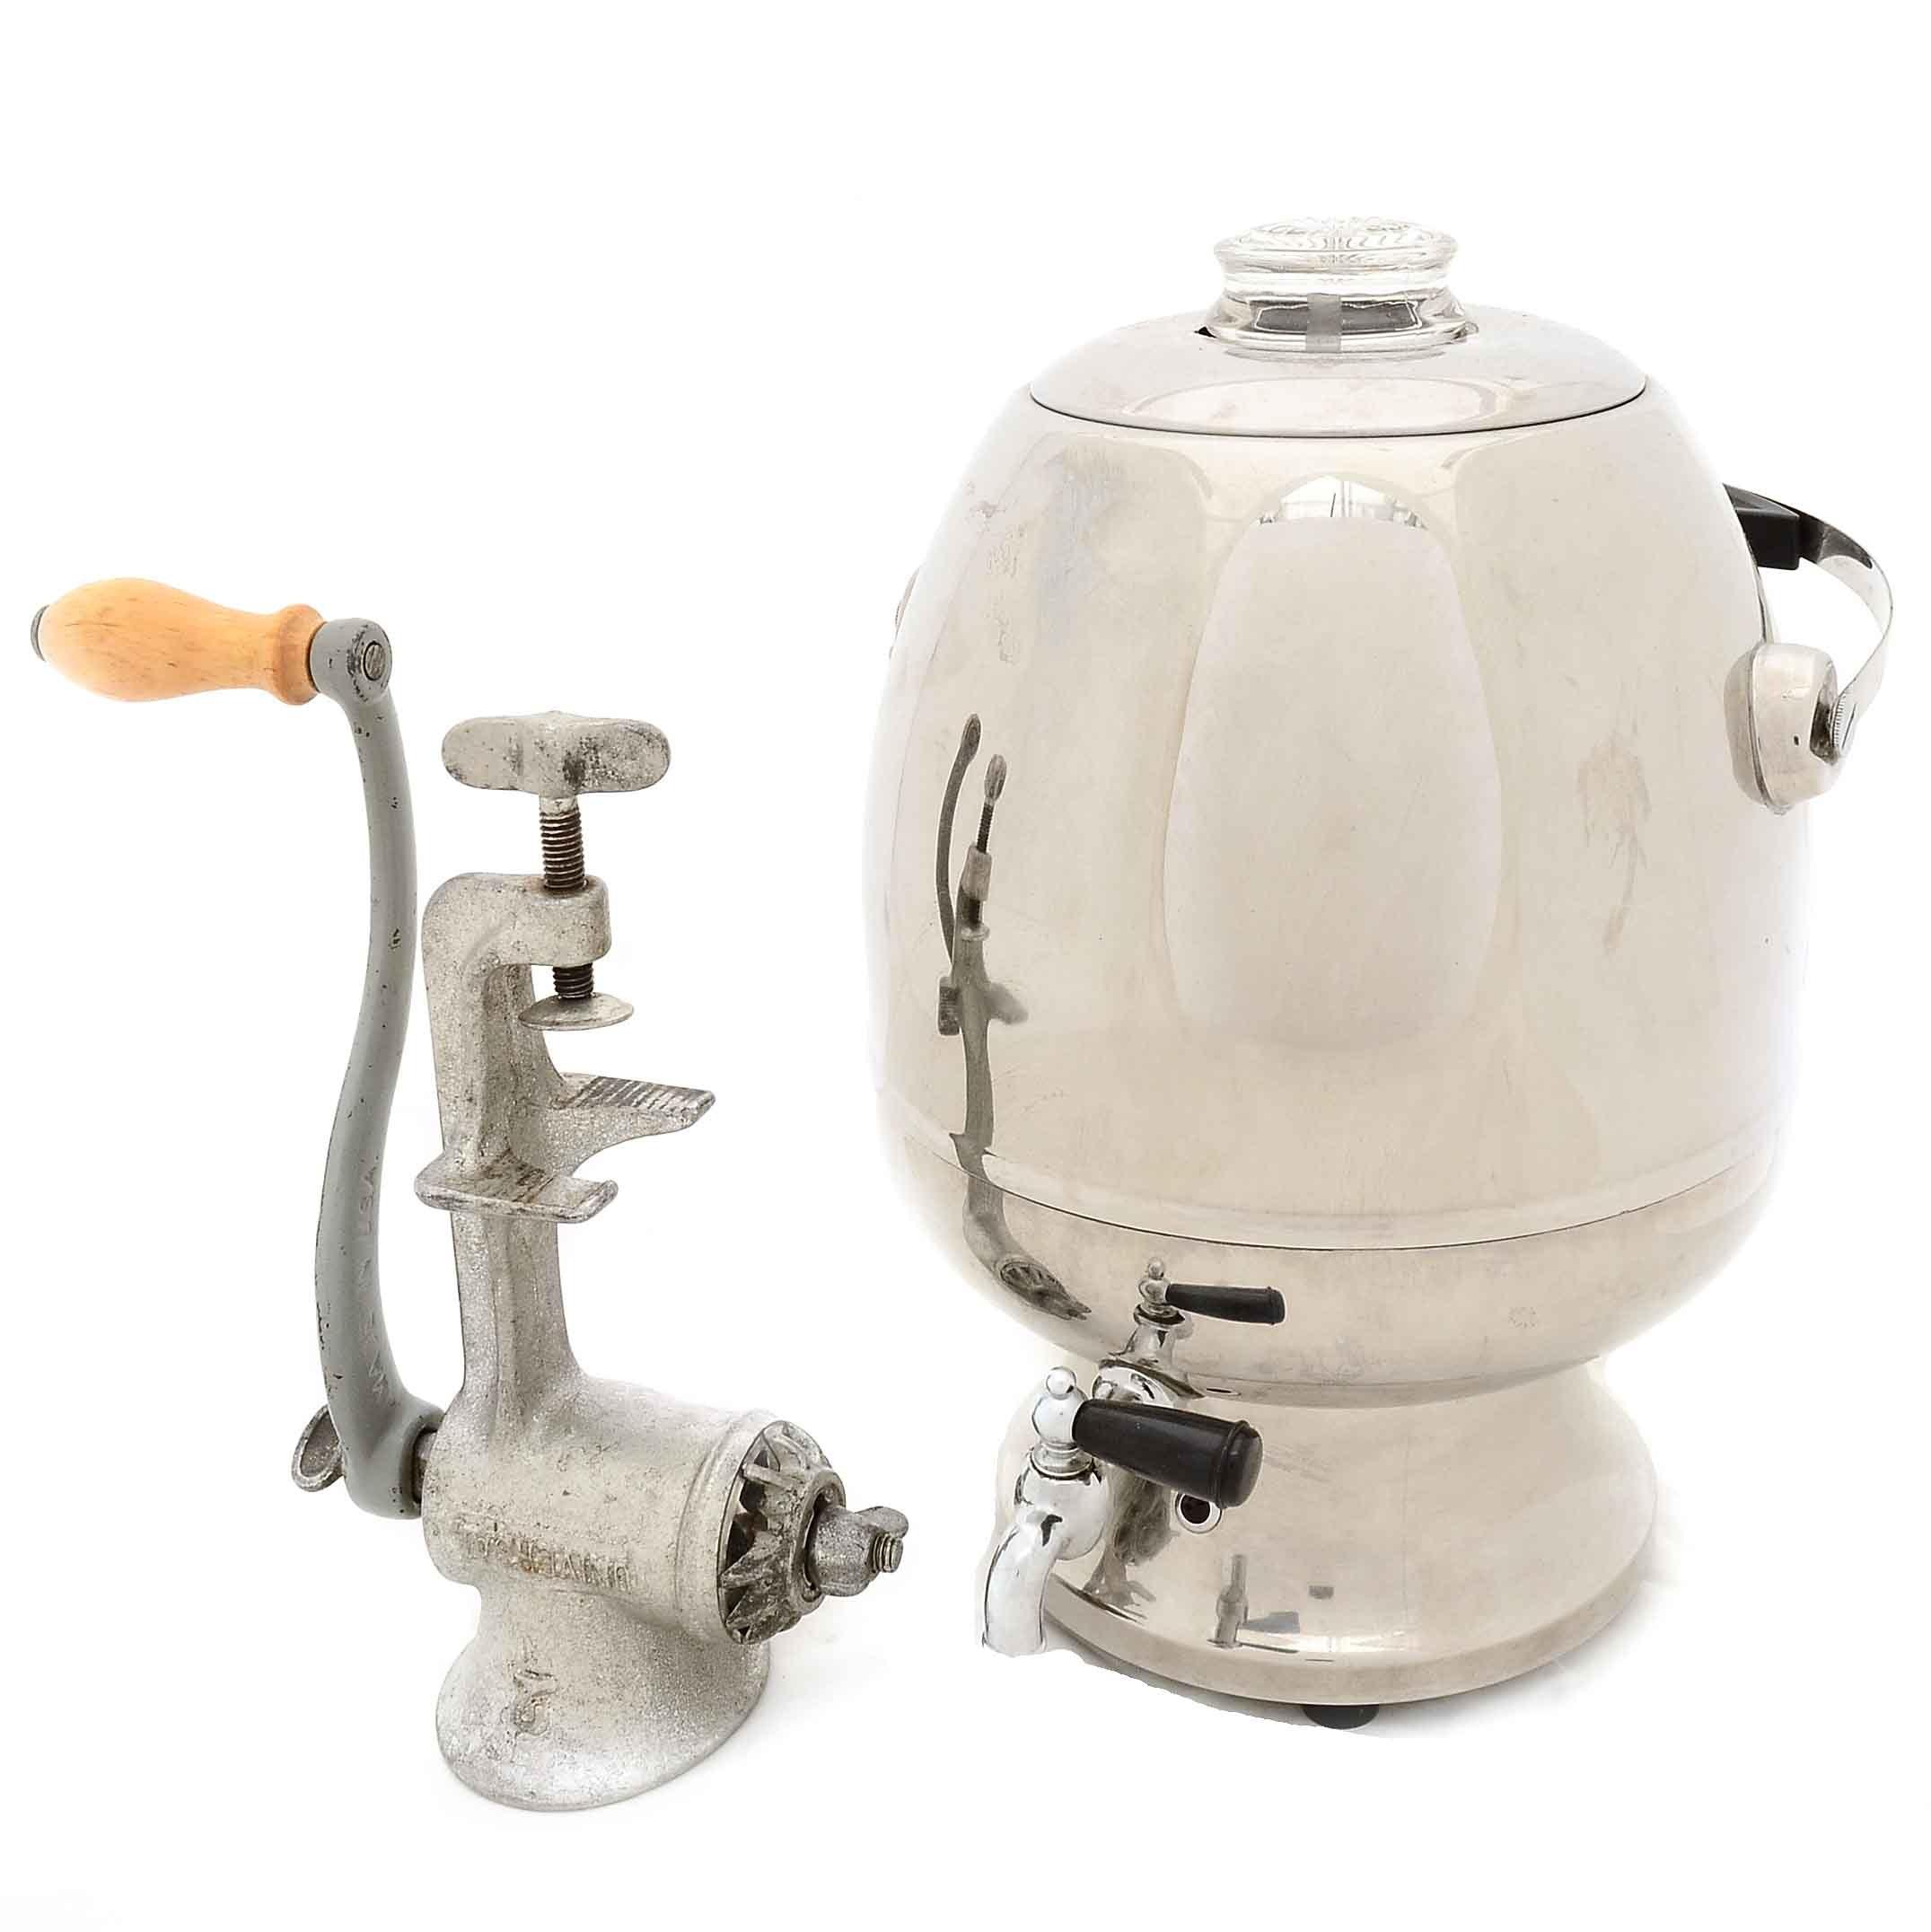 Vintage Coffee Percalator and Meat Grinder